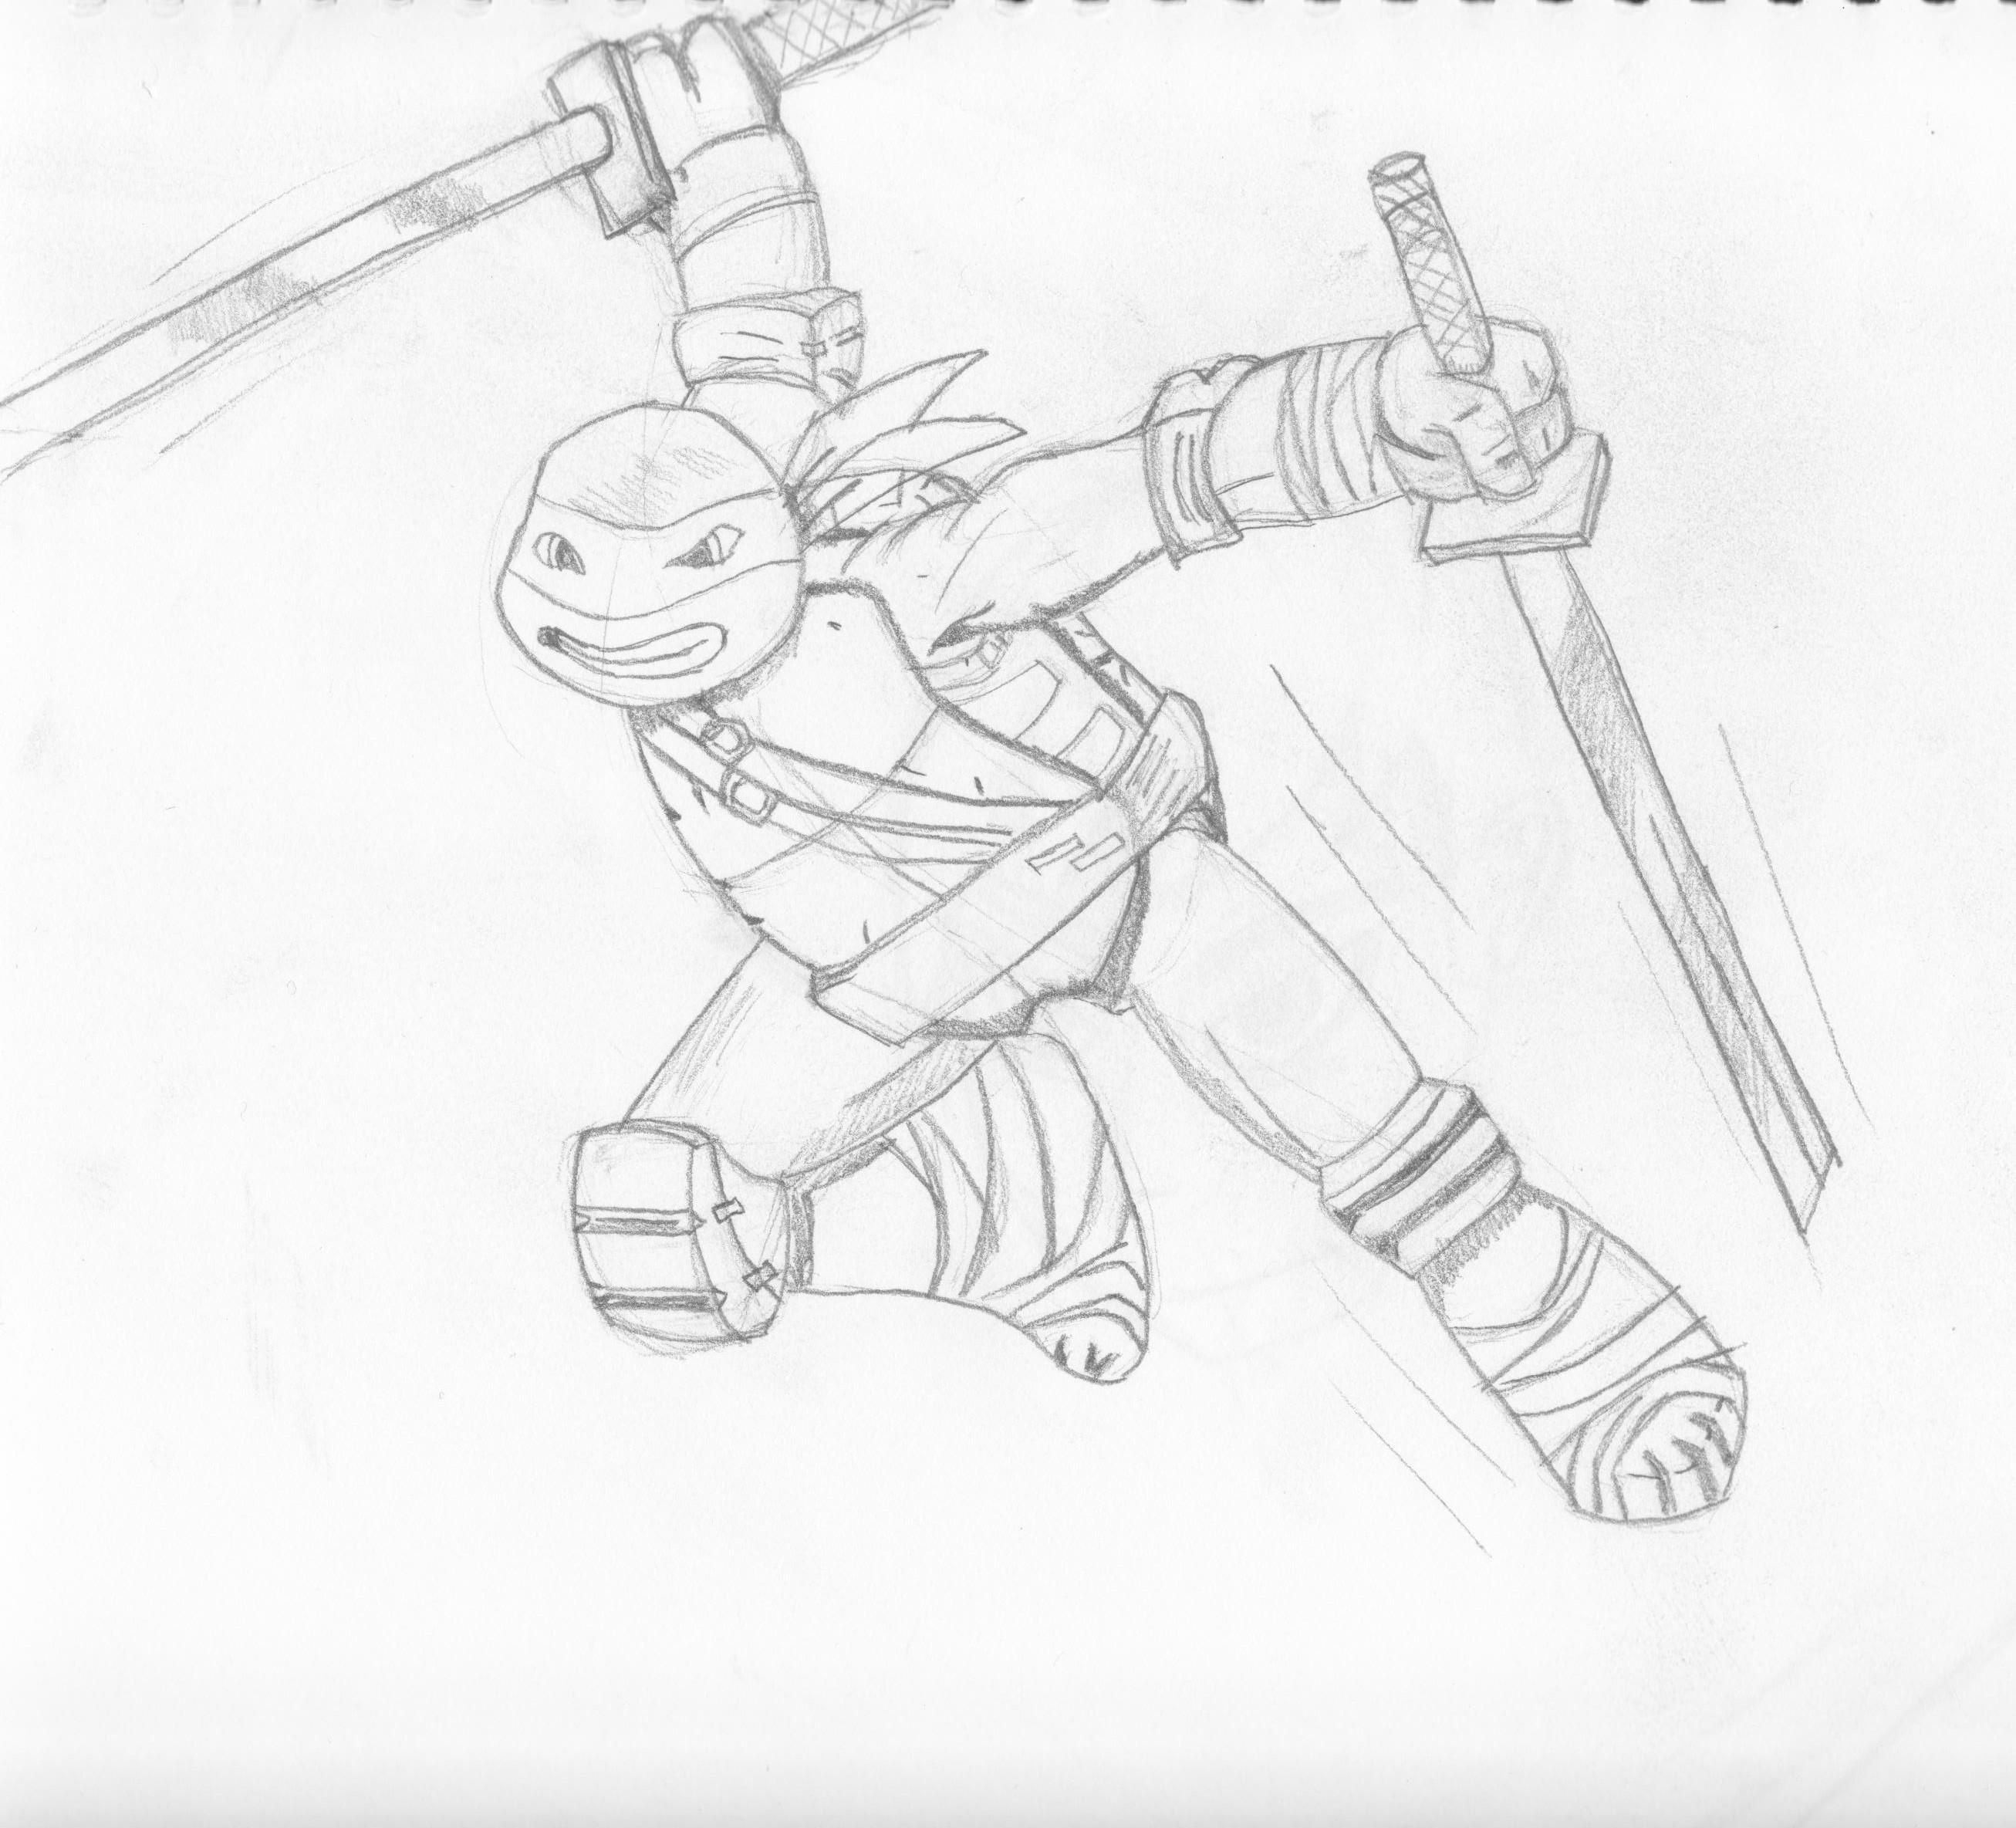 How To Draw Ninja Turtles Nickelodeon Style